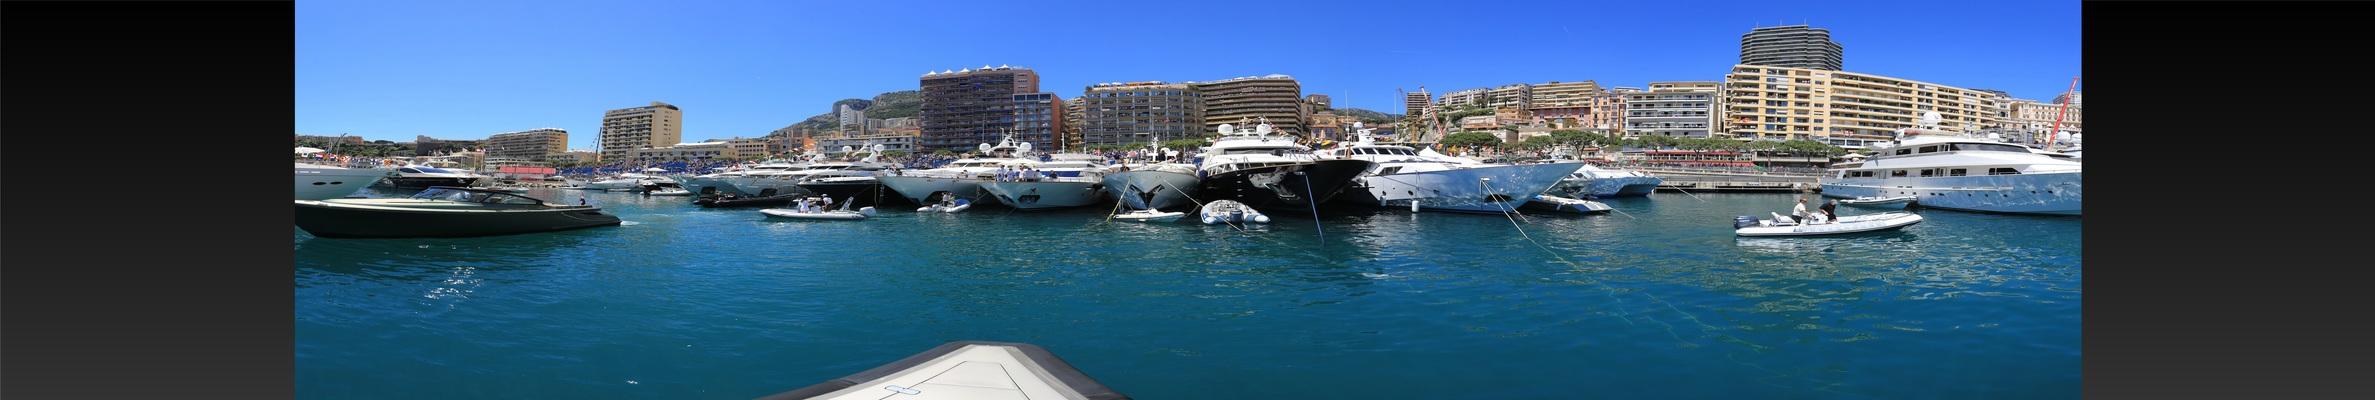 Monaco Grand Prix Tender